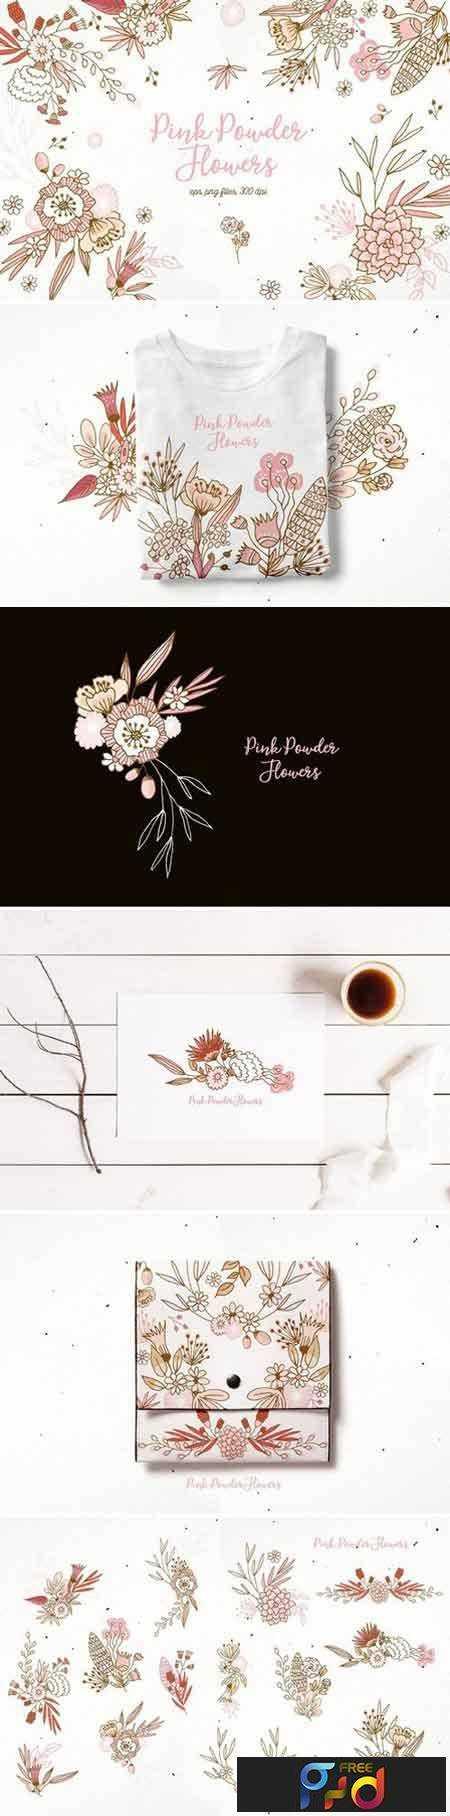 1706239 Pink Powder Flowers 1871356 1